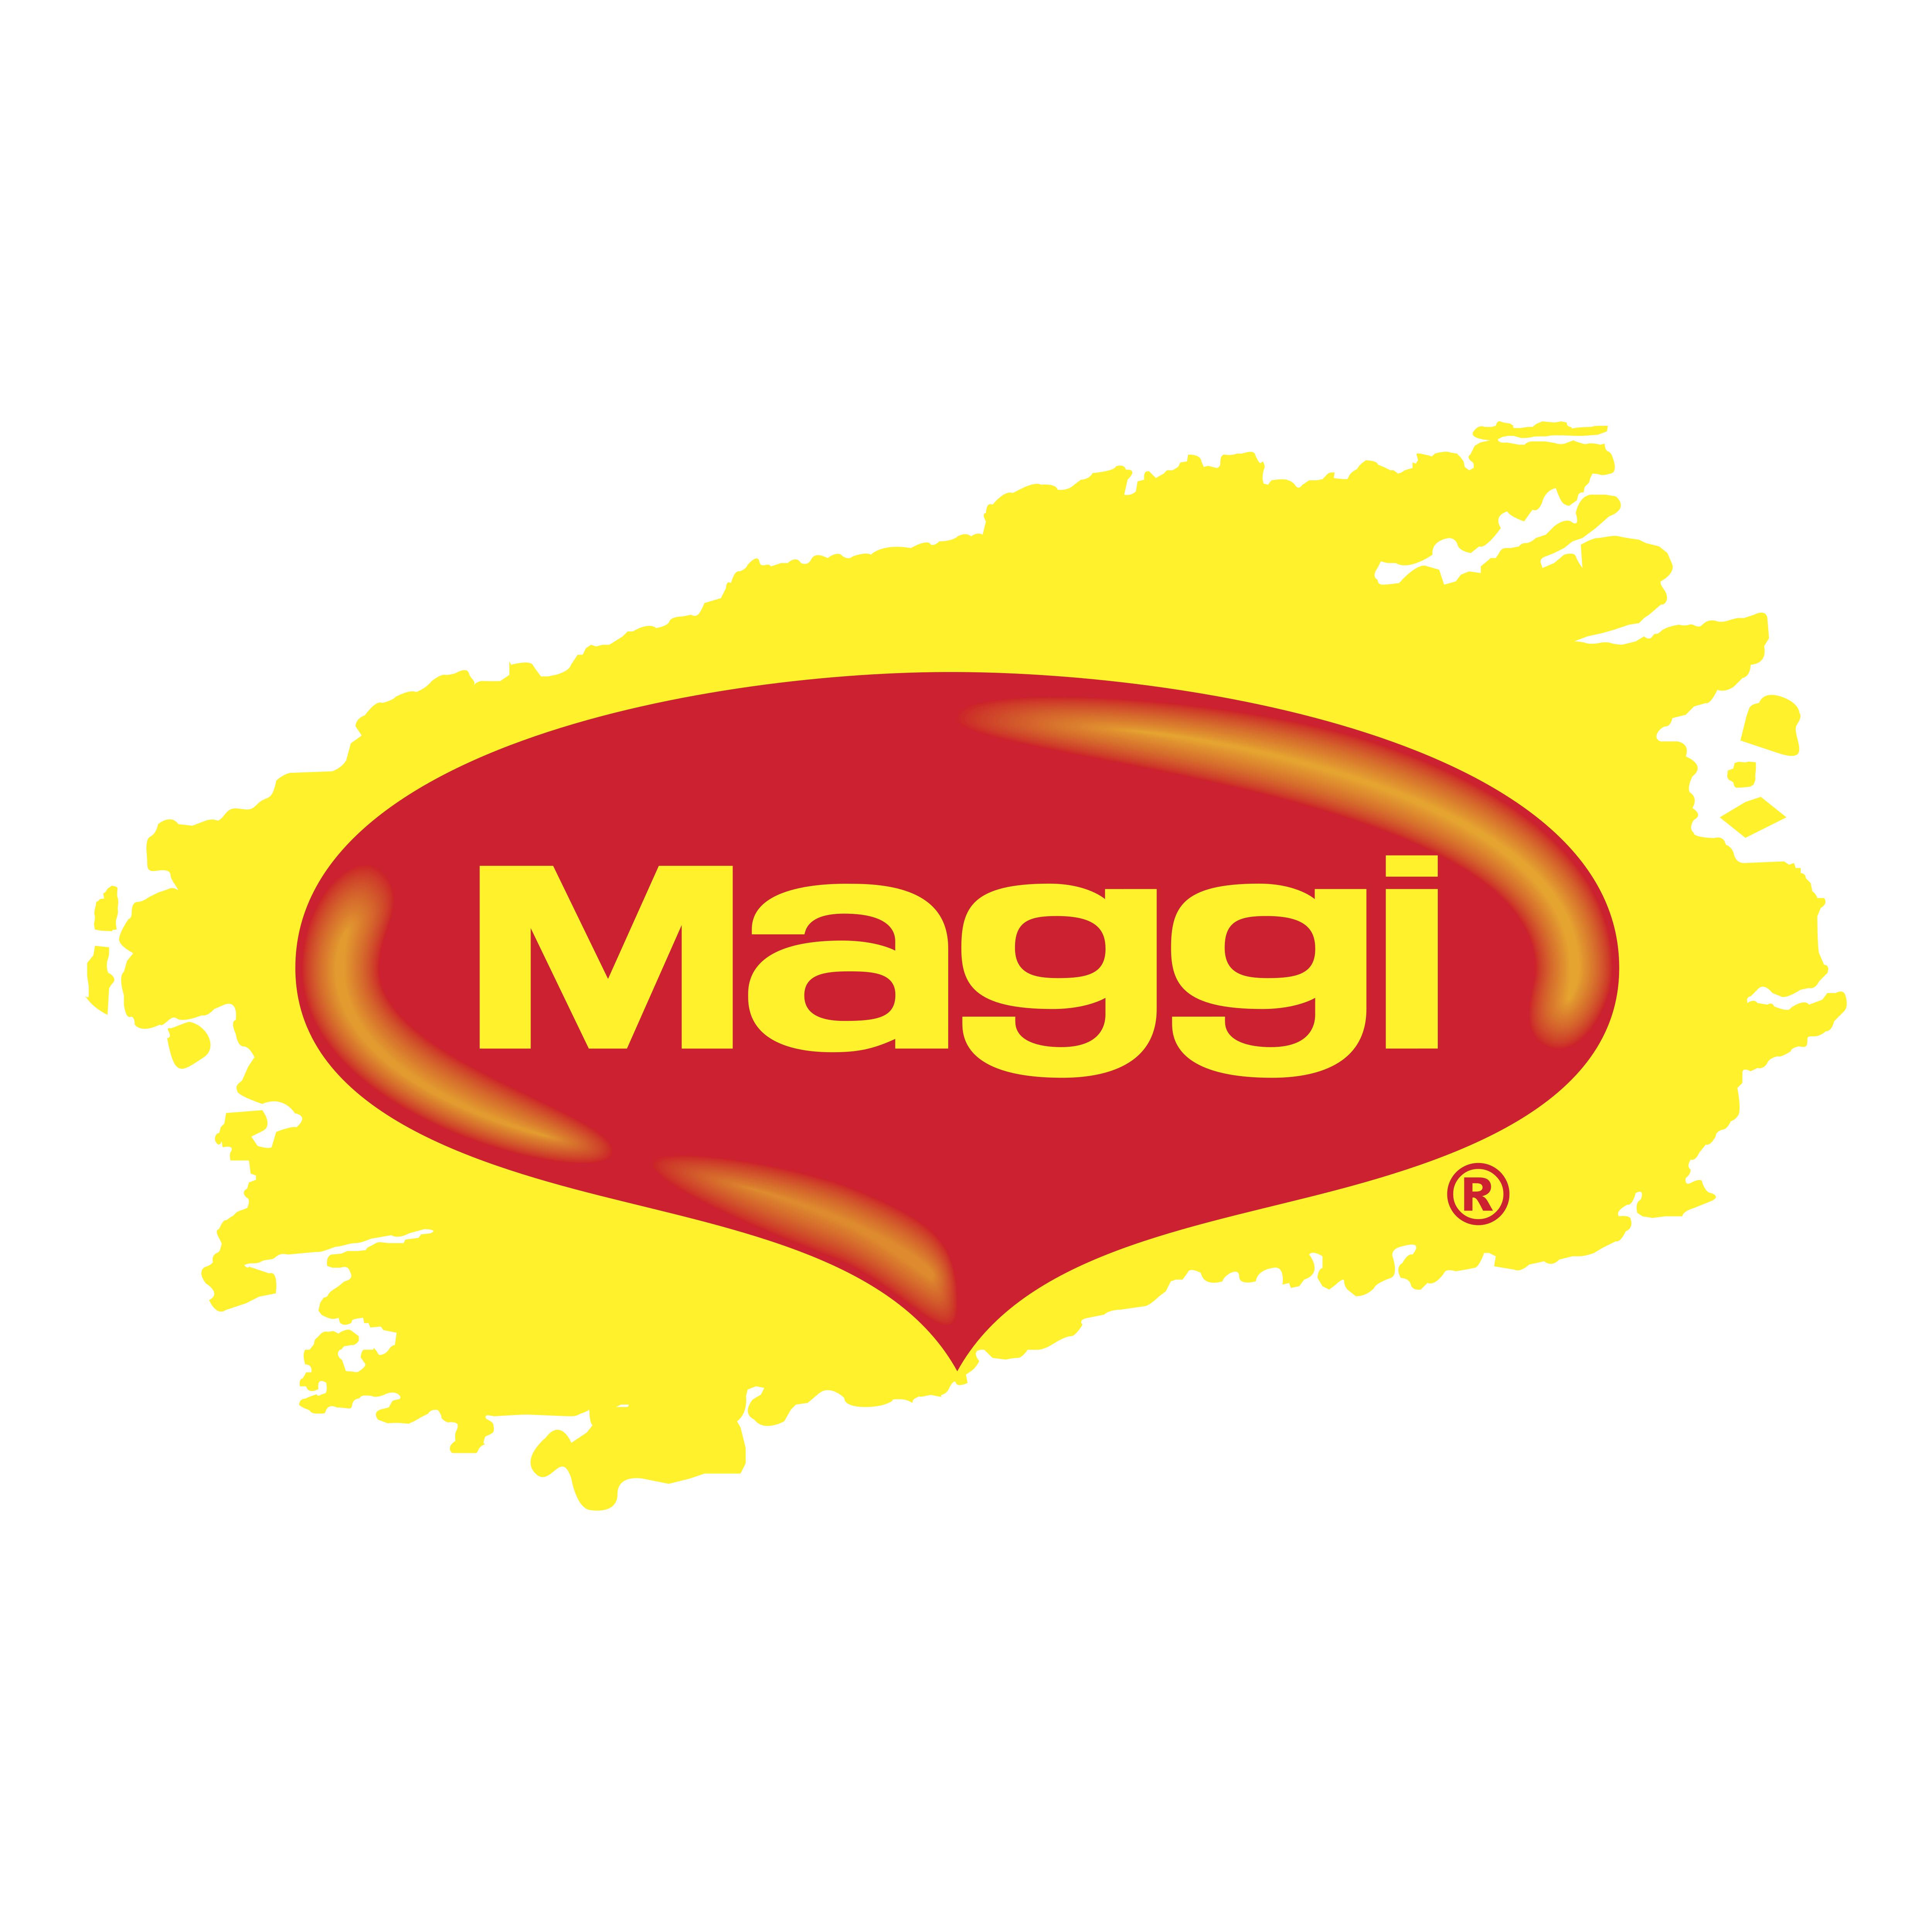 Maggi.